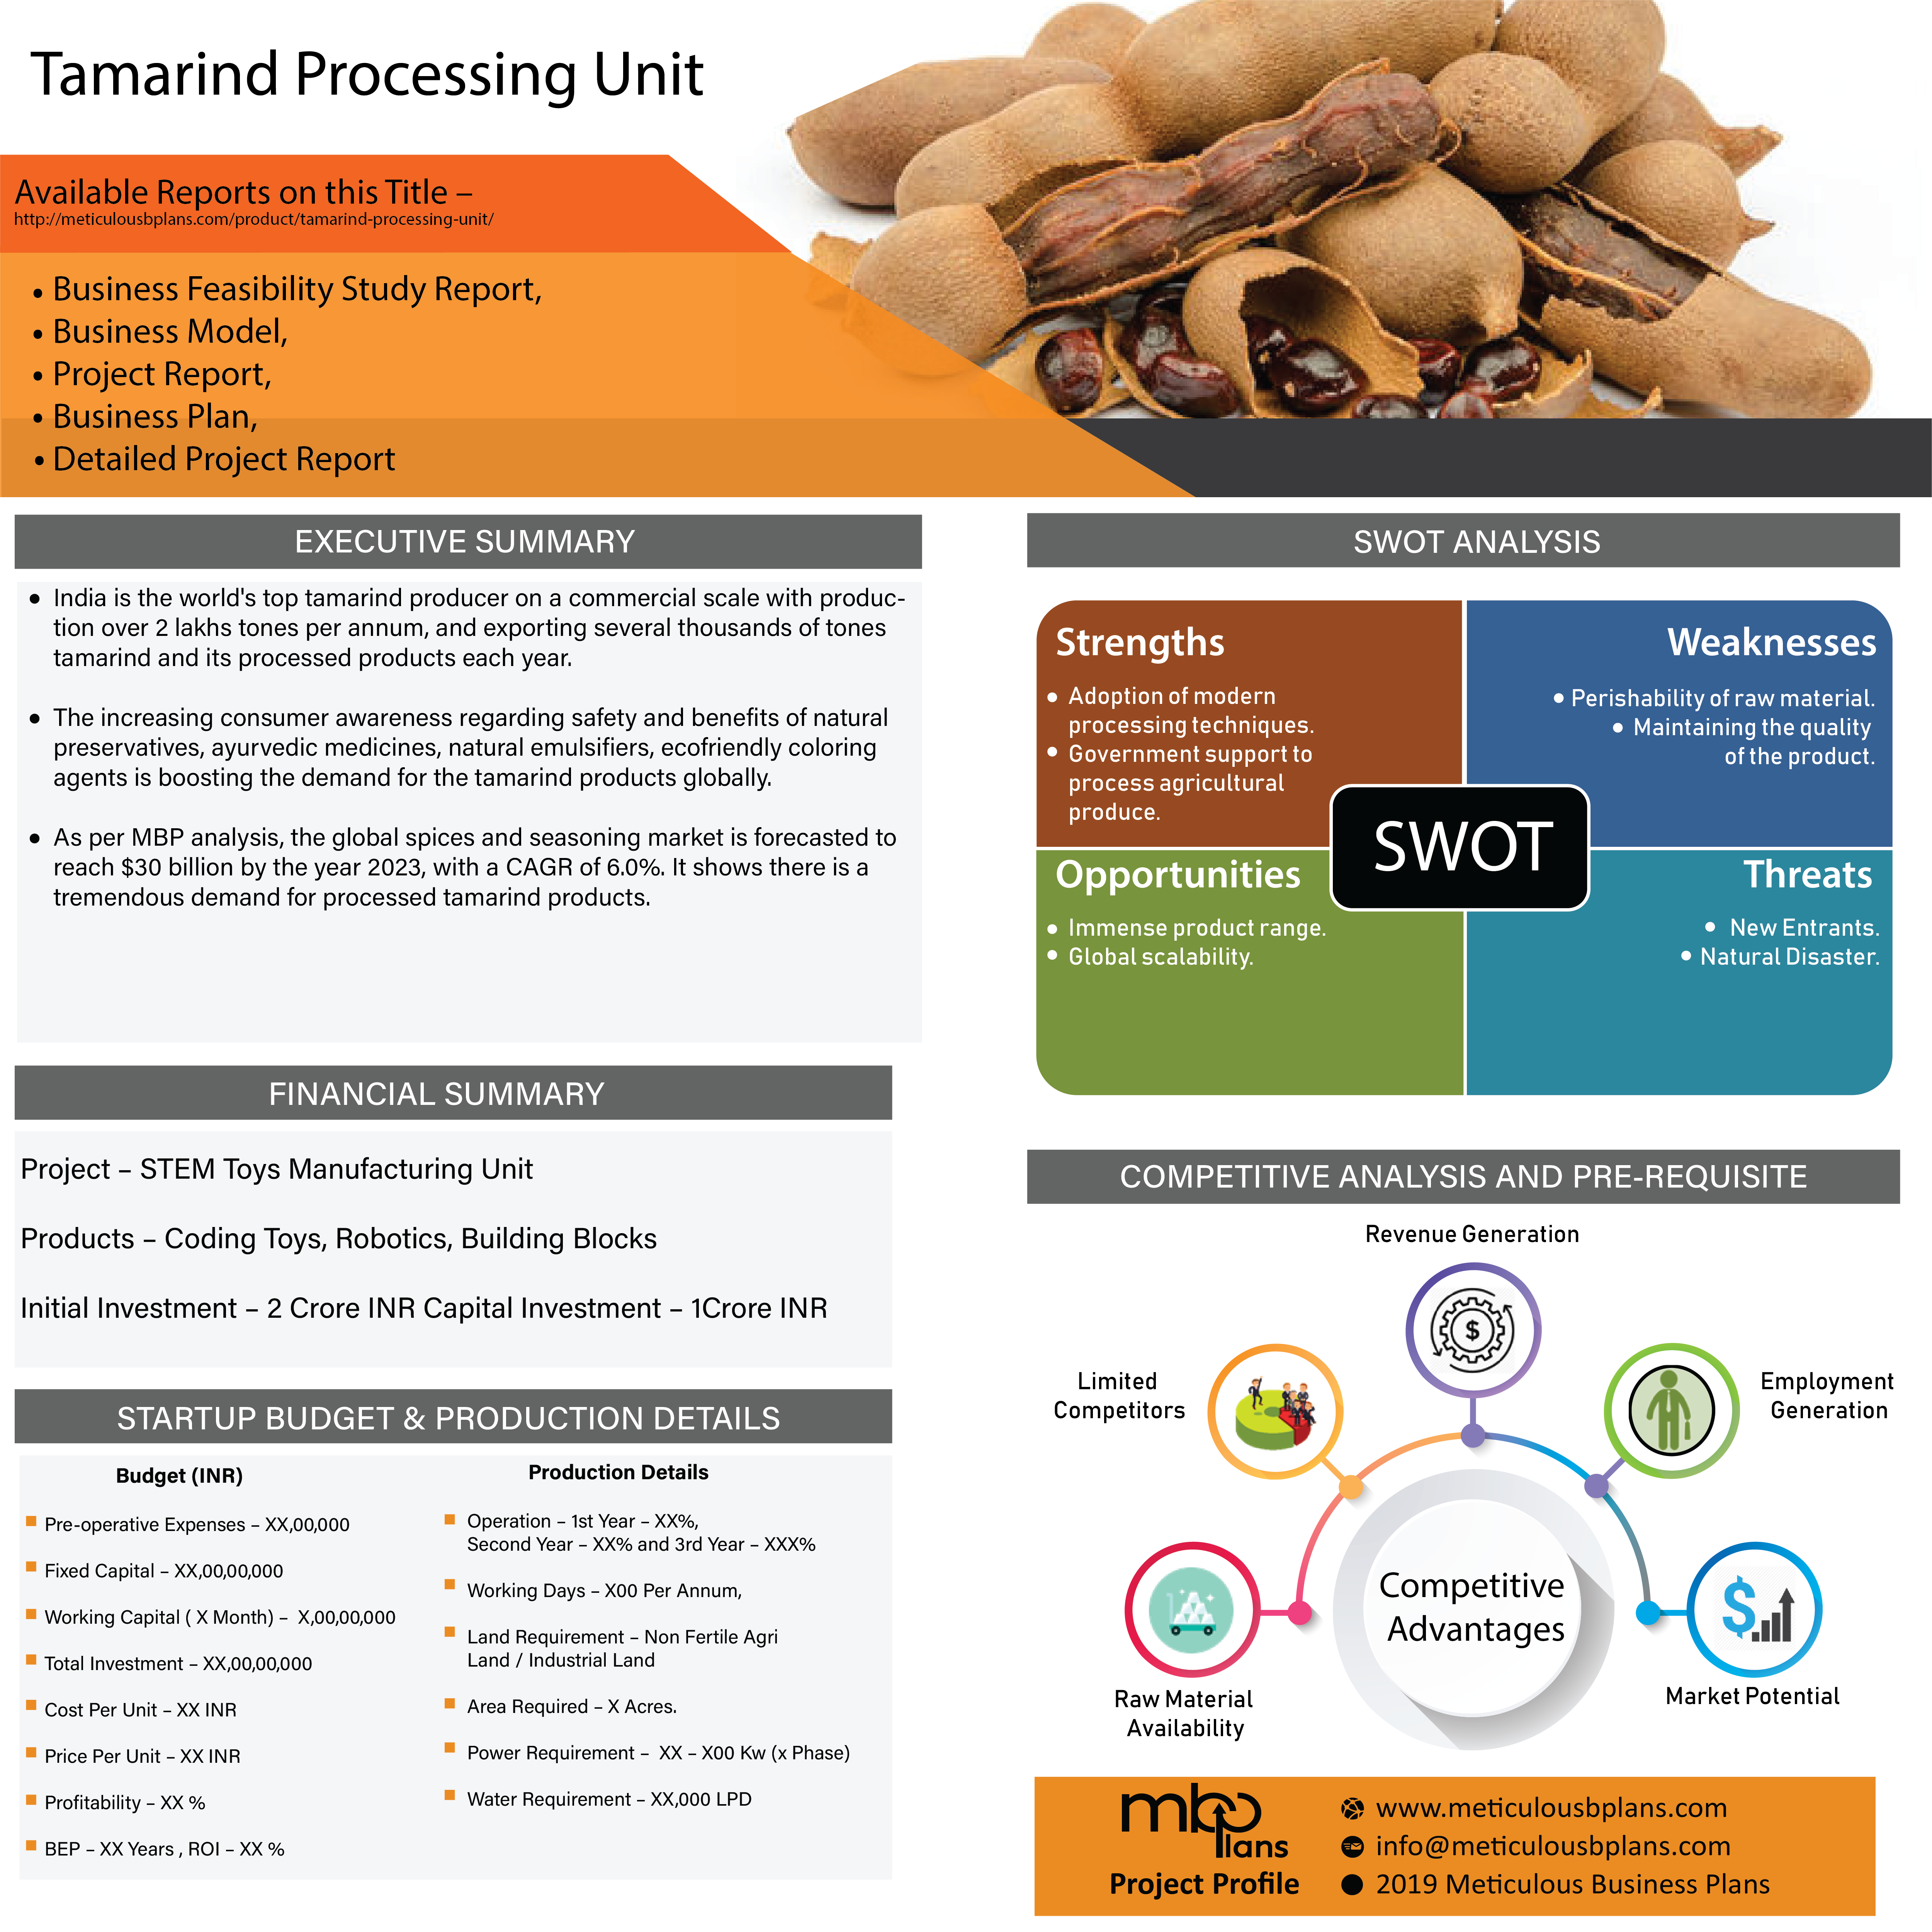 Tamarind Processing Unit Tamarind Natural Preservatives Process